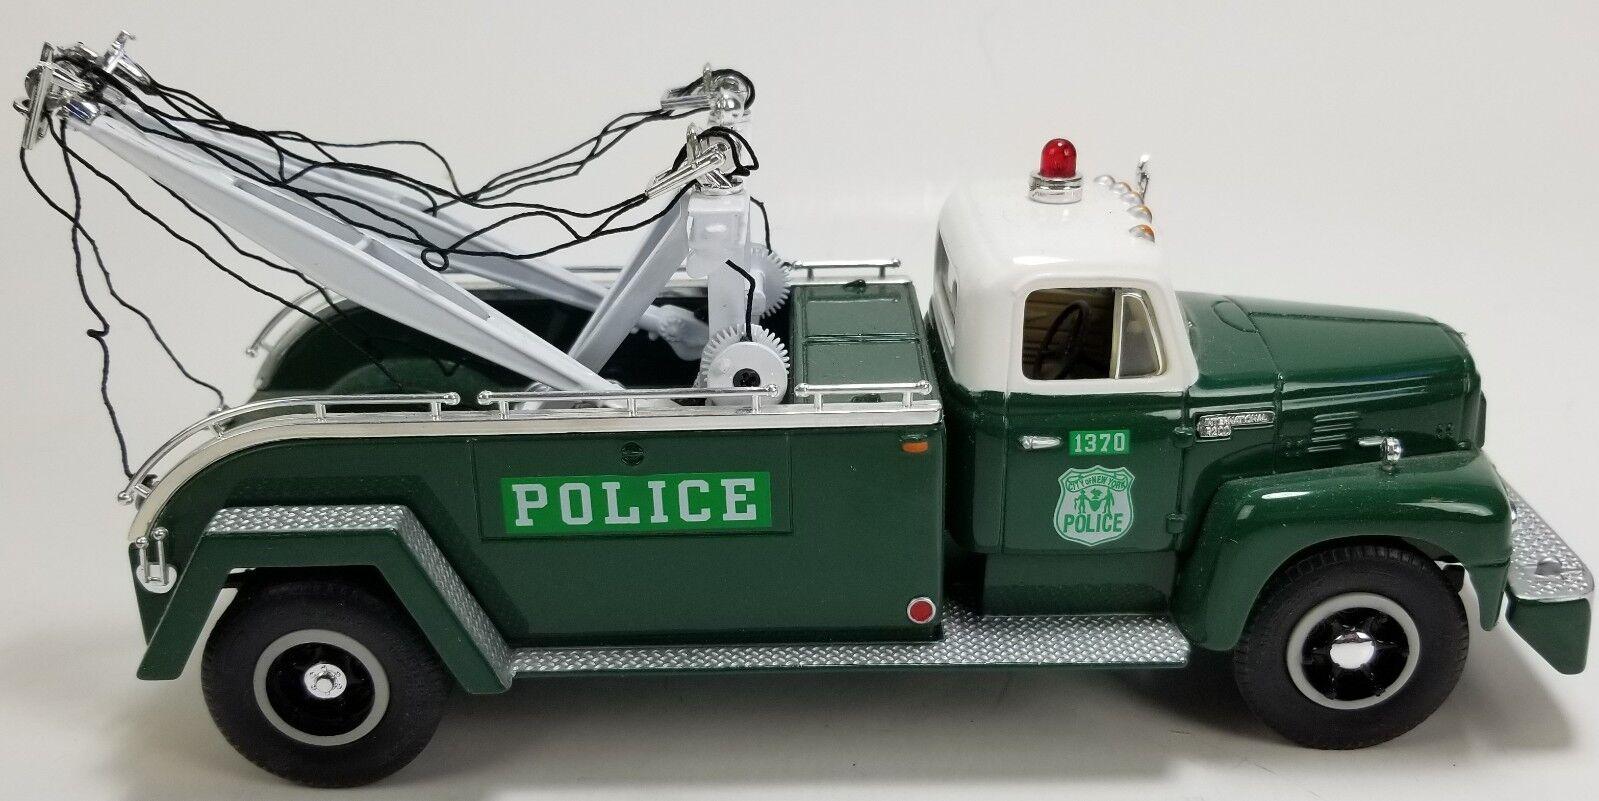 1957 International R-200 Tow Truck 19-1195 policía de Nueva York Modelo Diecast First Gear